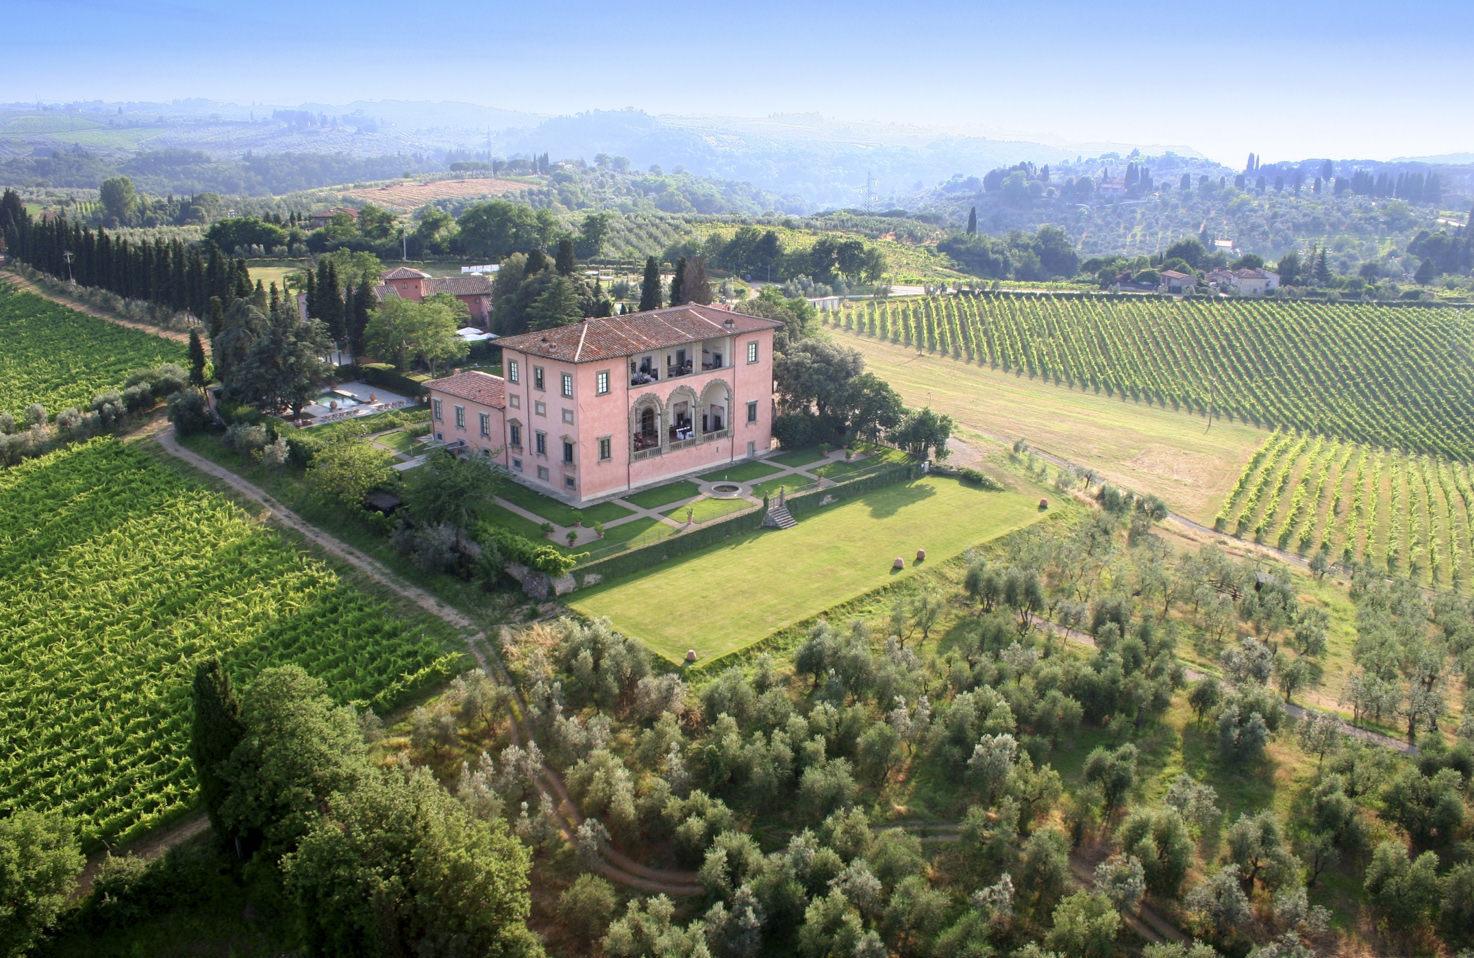 Villa Mangiacane in Chianti, Tuscany